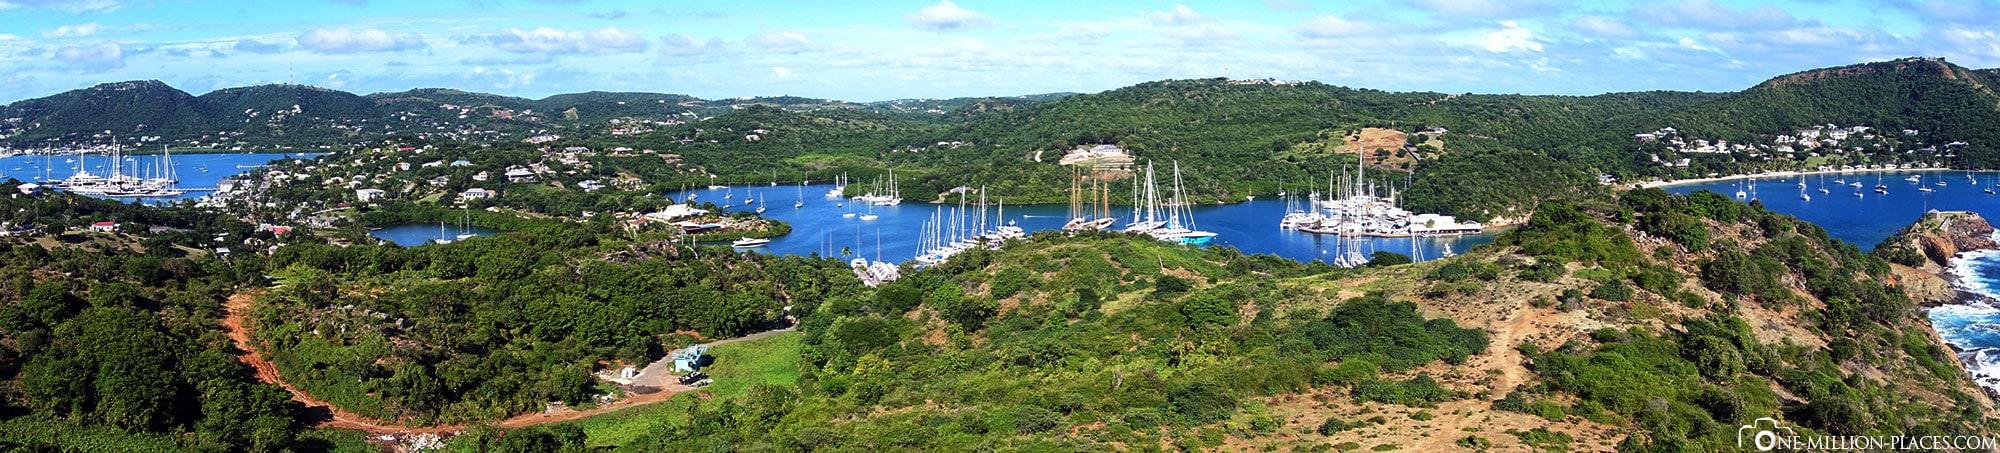 Panoramabild, Middle Ground Trail , Antigua, St. John's, Karibik, Welterbe, Sehenswürdigkeiten, Auf eigene Faust, Reisebericht